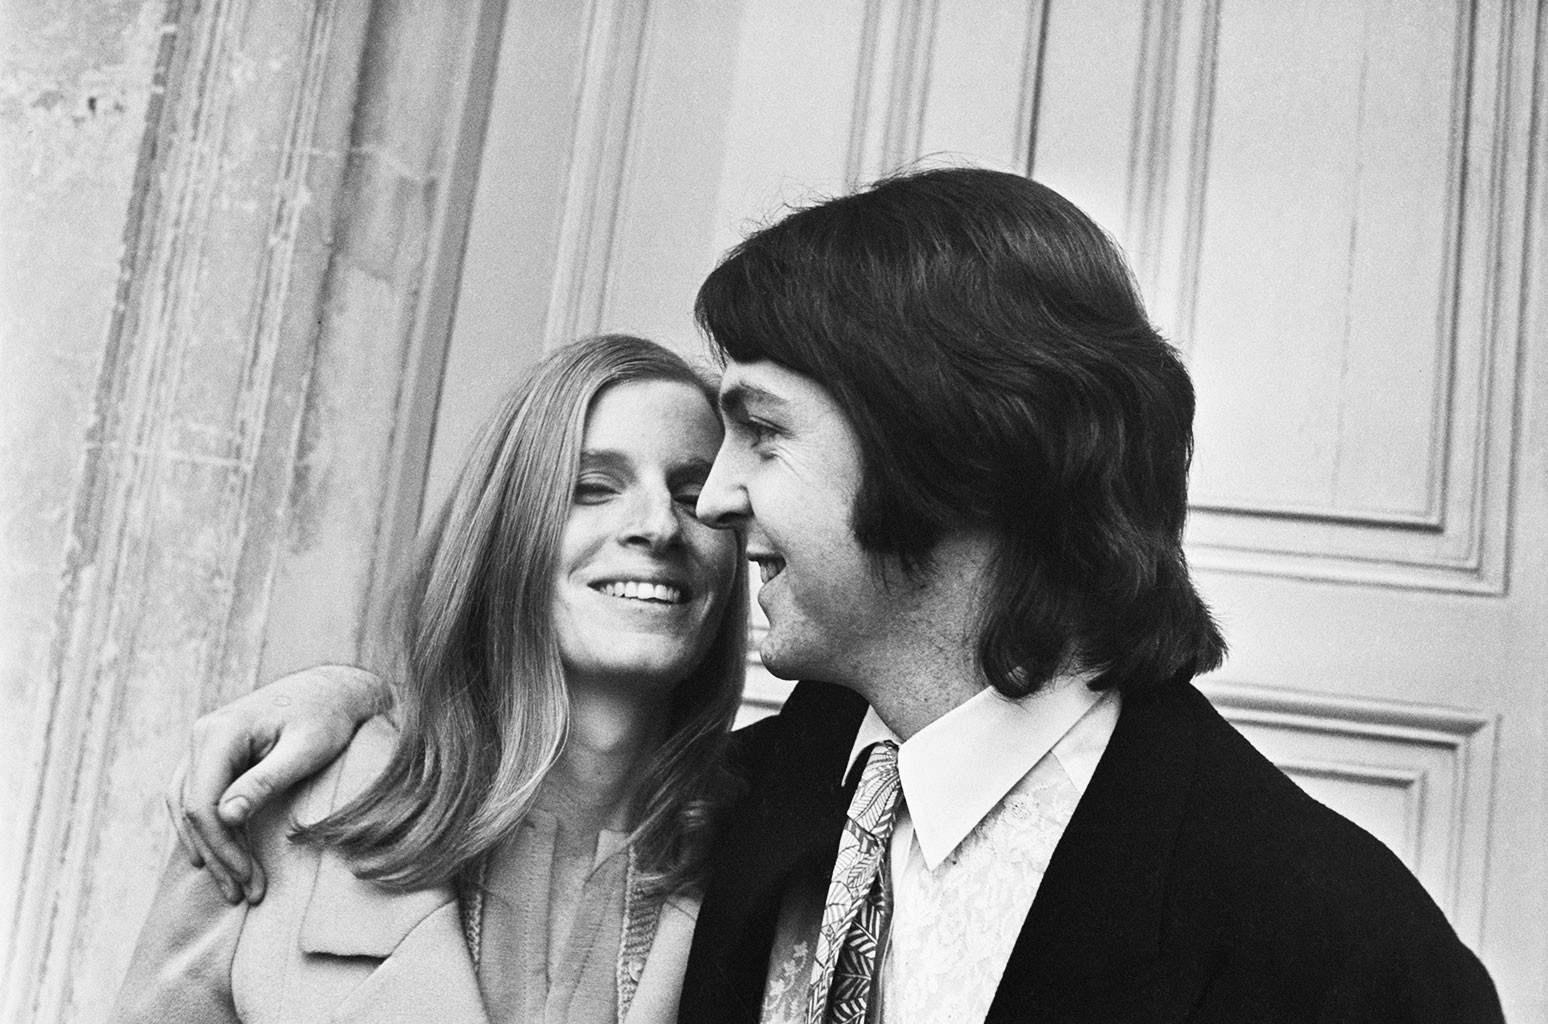 Paul McCartney marries American musician and photographer Linda Eastman